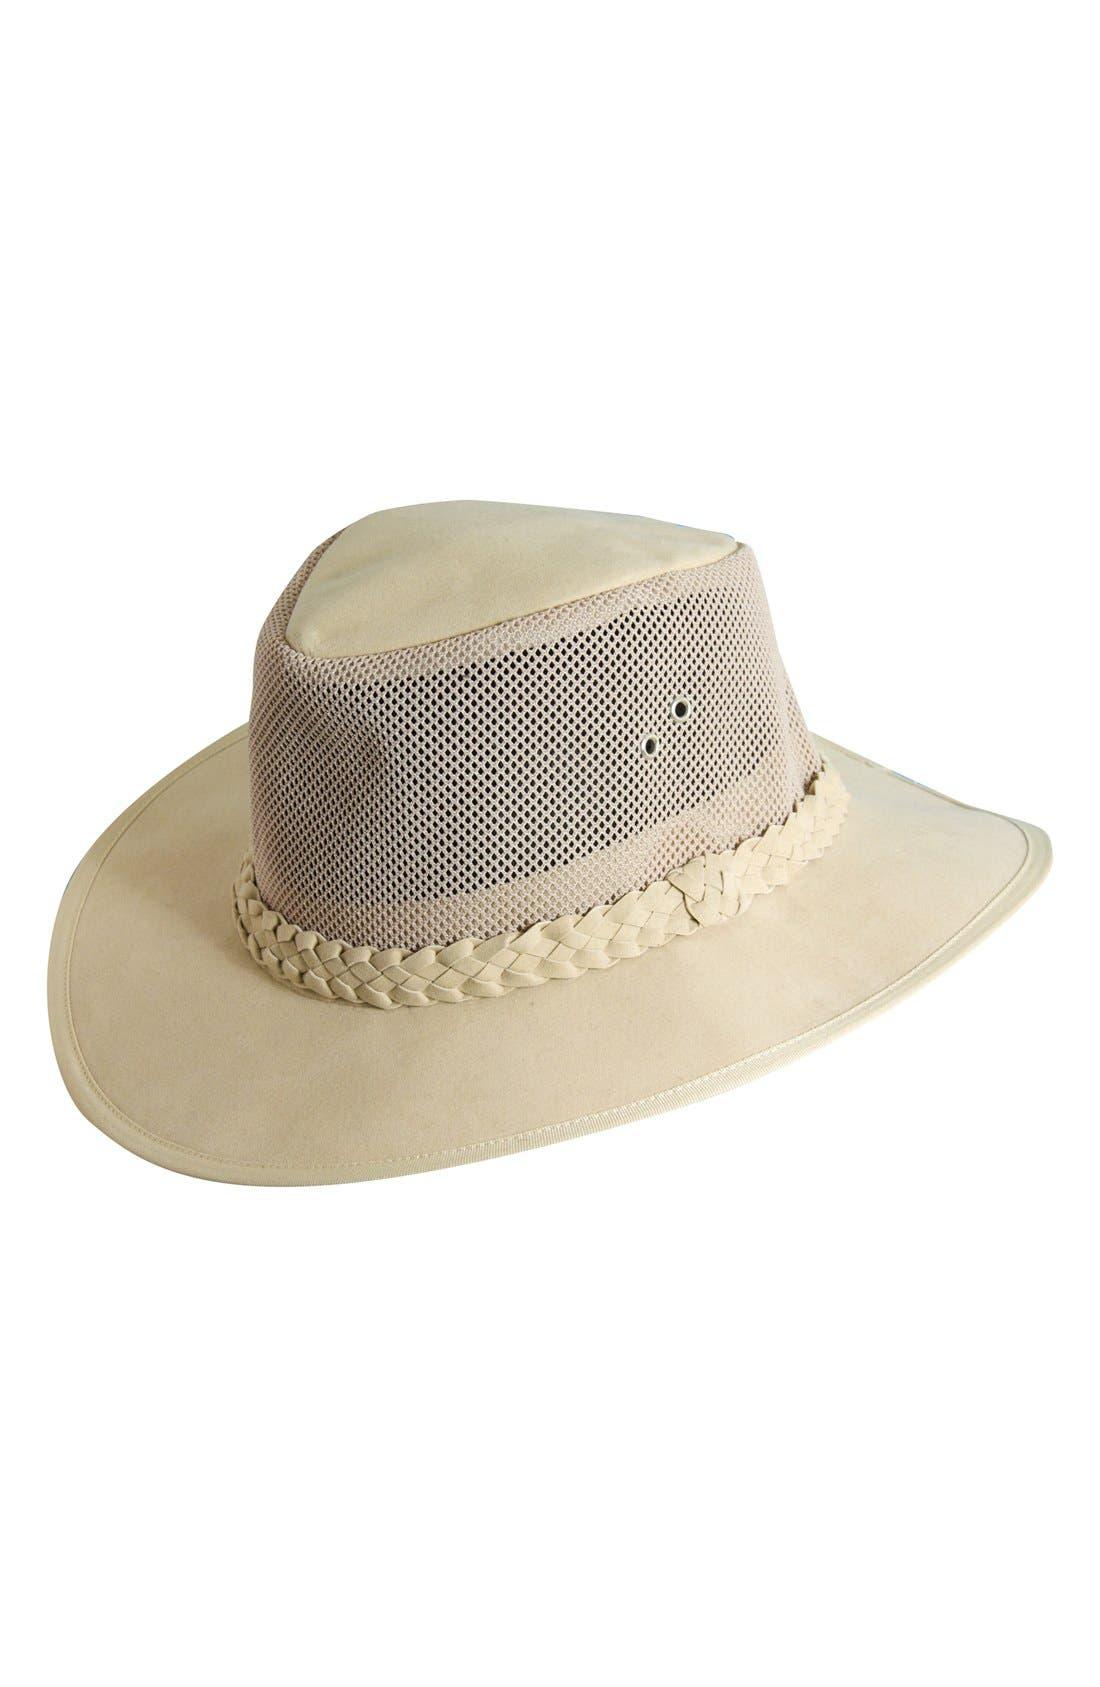 Soaker Hat,                         Main,                         color, NATURAL